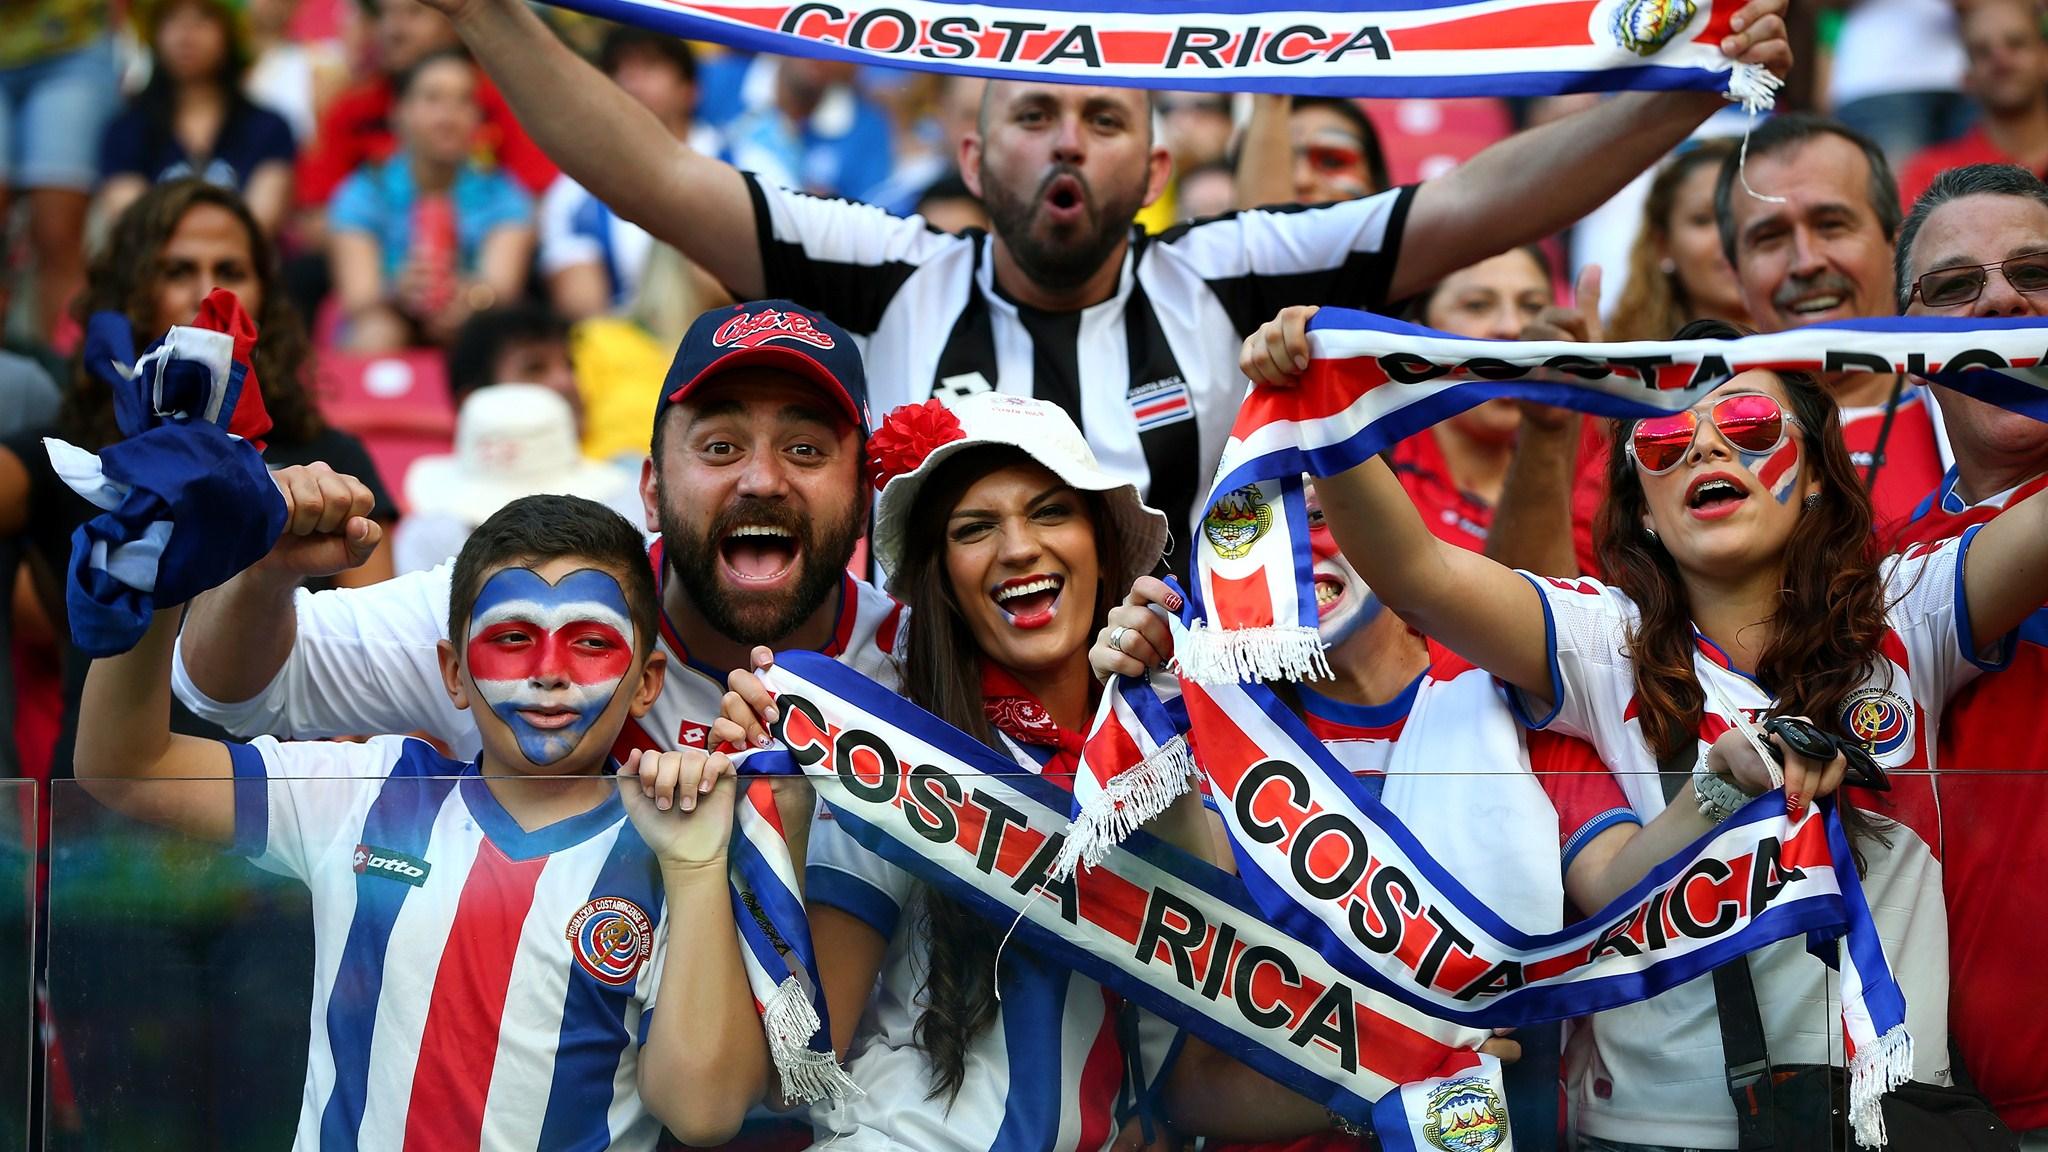 180 - Costa Rica-Greece [1-1 - Costa Rica win on penalties (5 - 3)] -- 29 Jun 2014 - 17-00